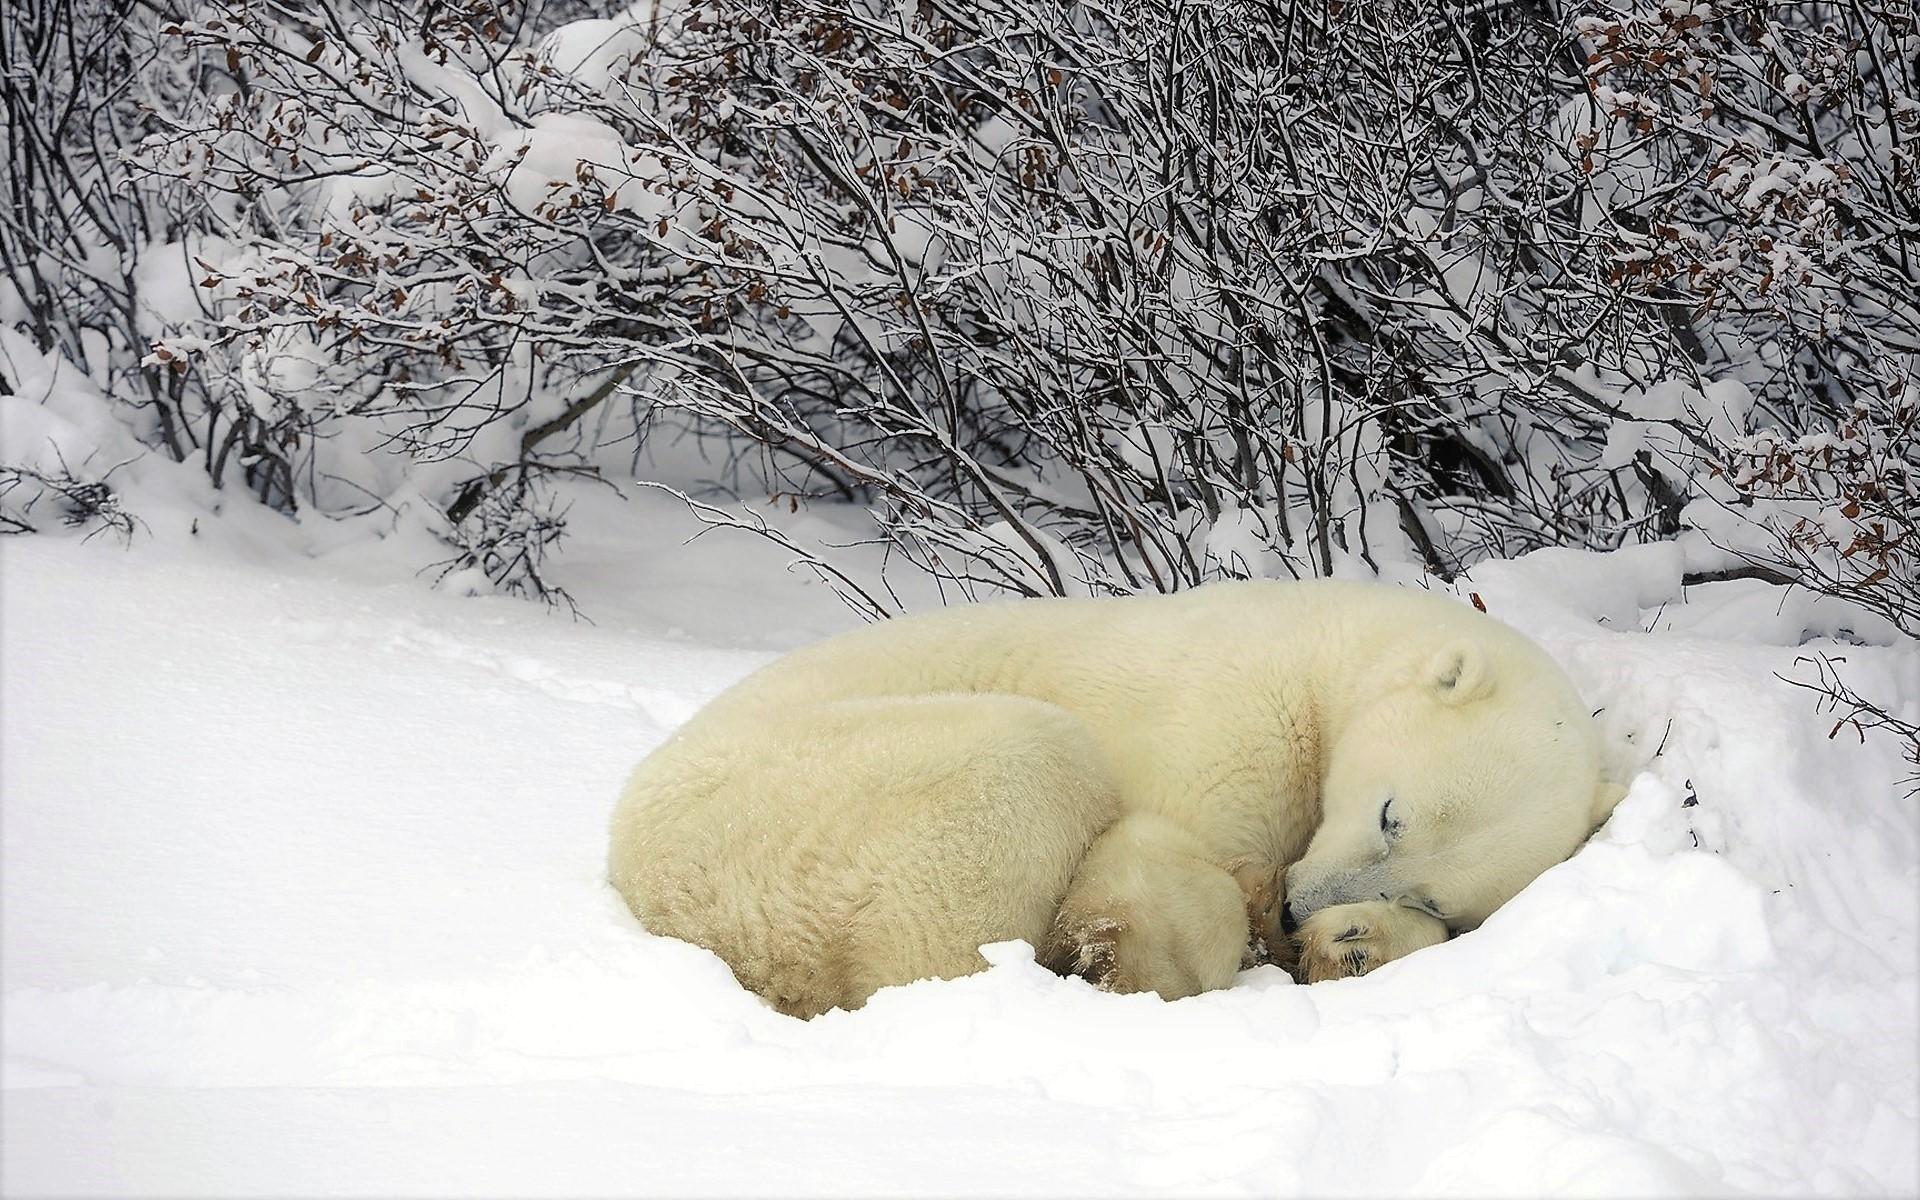 animal canada cute polar bear sleeping snow winter. Black Bedroom Furniture Sets. Home Design Ideas